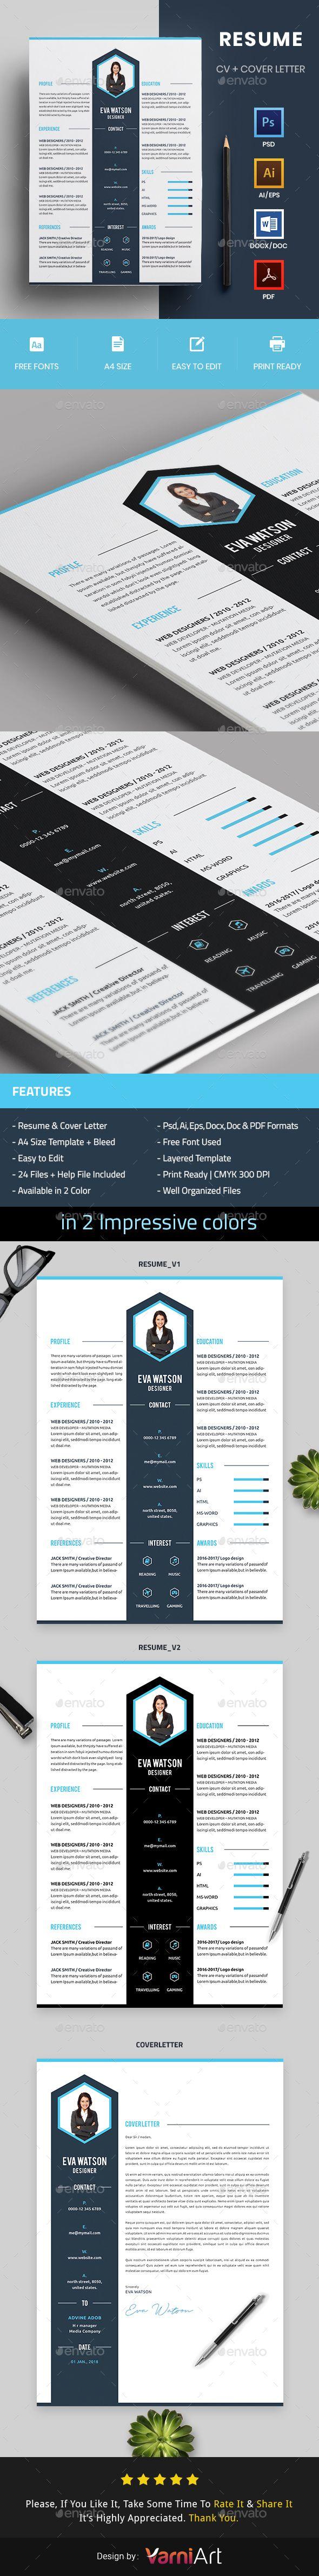 resume template ai illustrator and cv template - Illustrator Cv